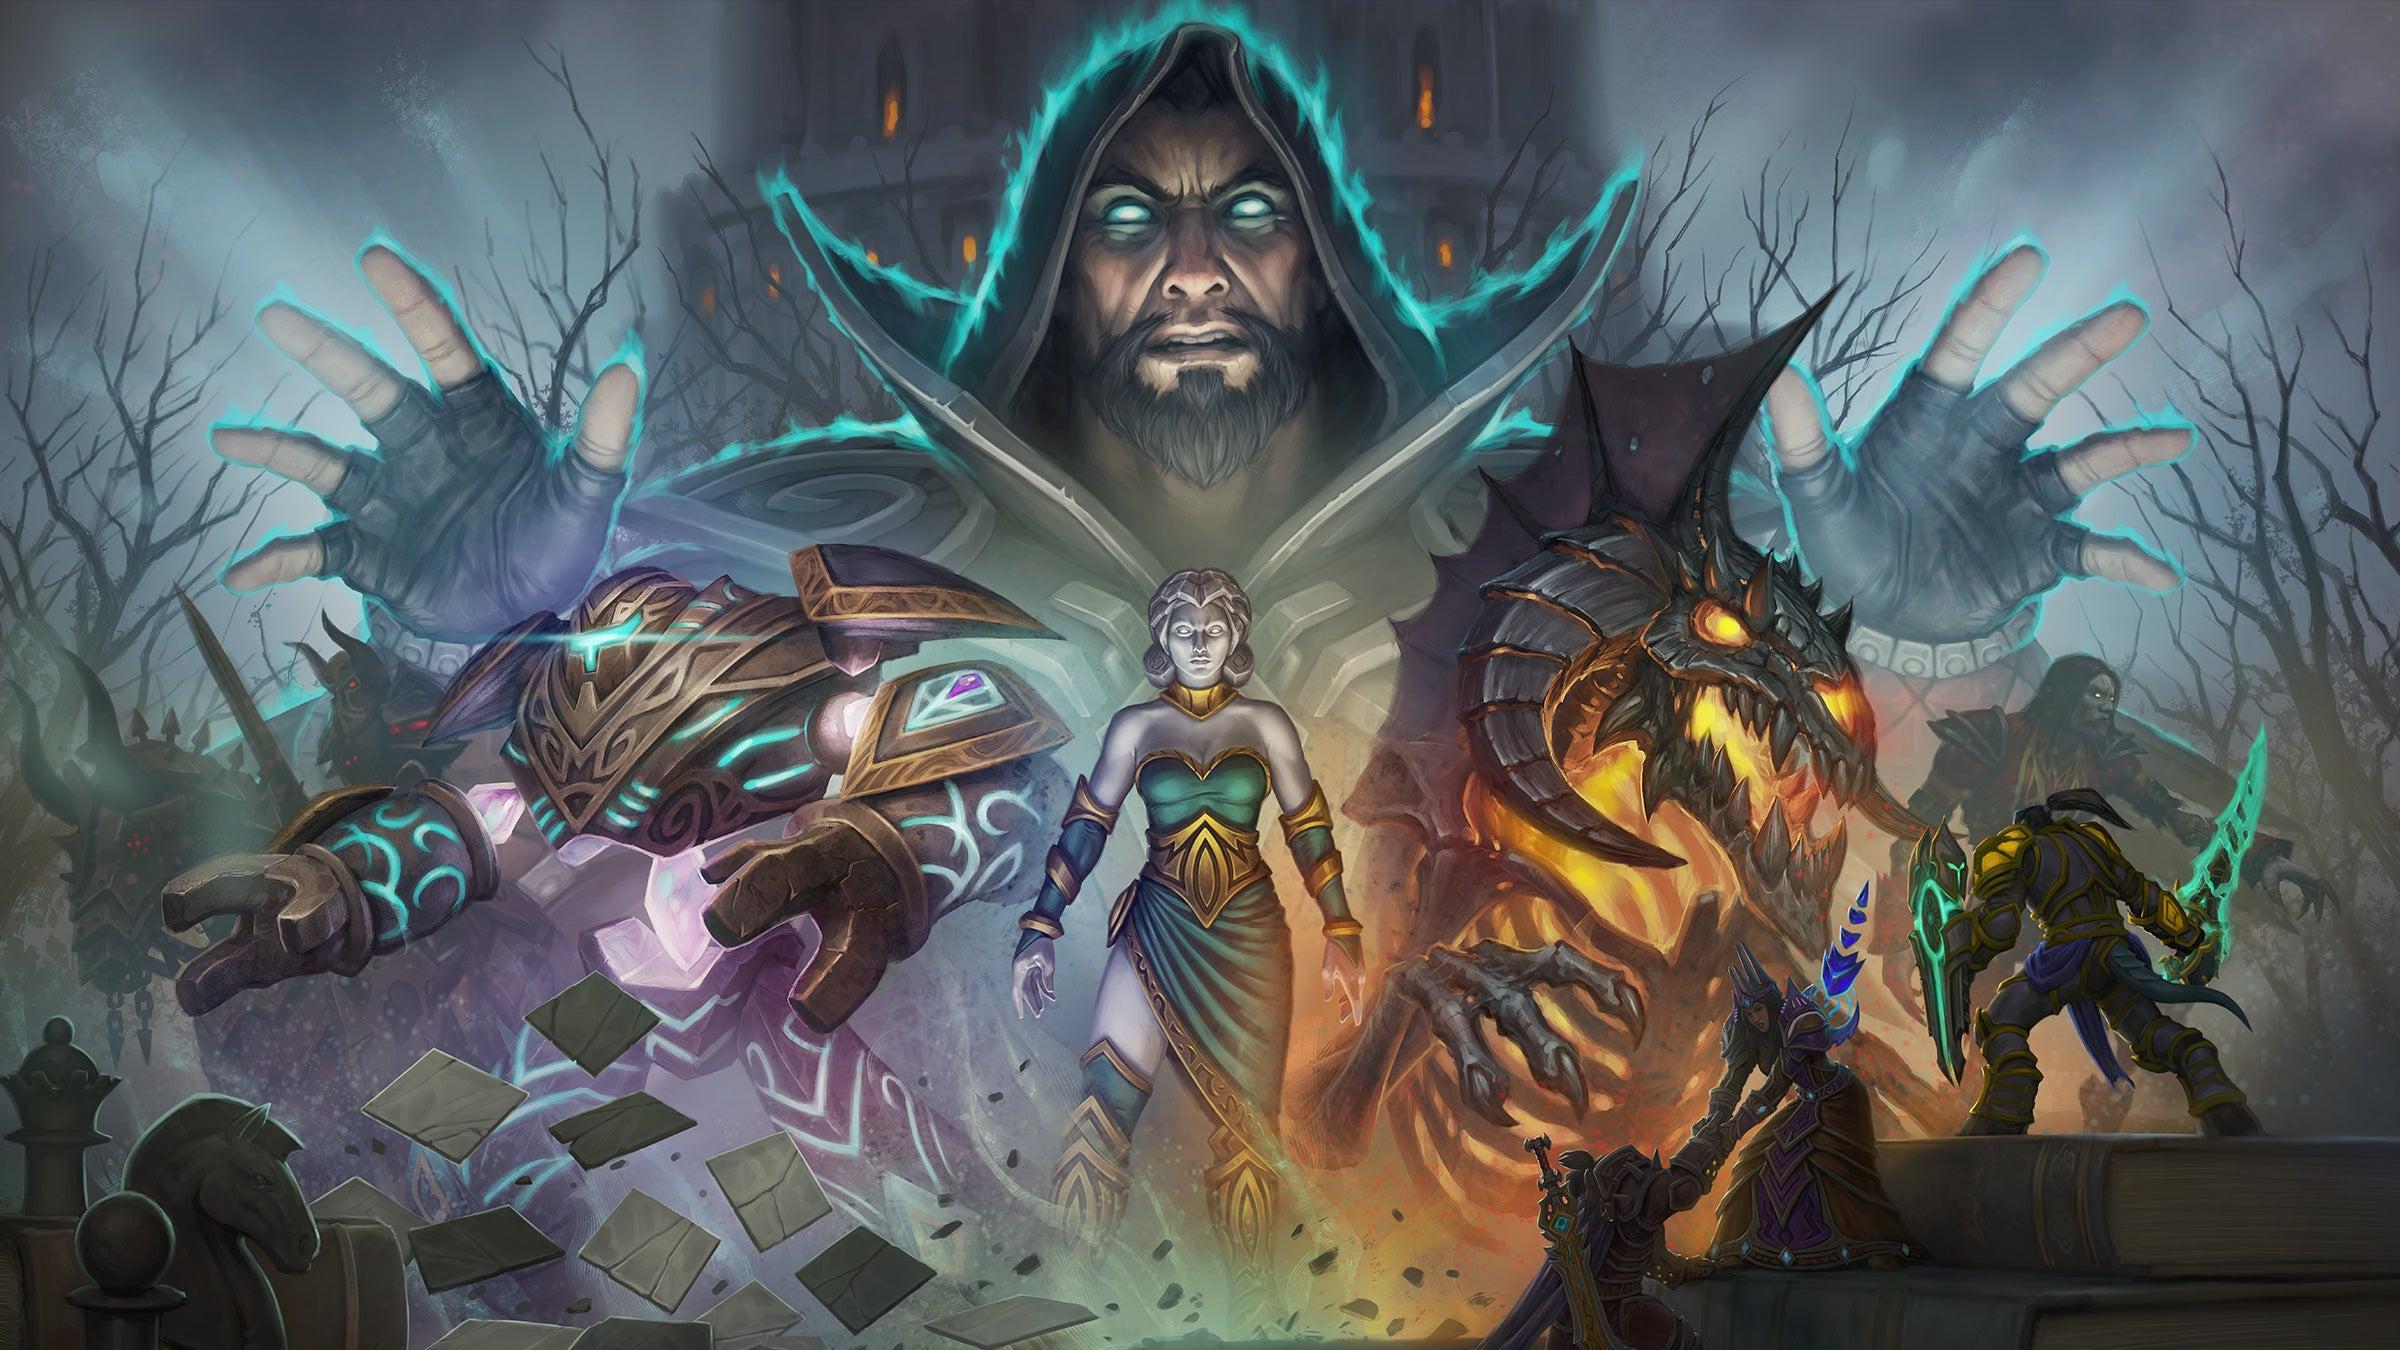 World Of Warcraft's Return To Karazhan Update Is Live